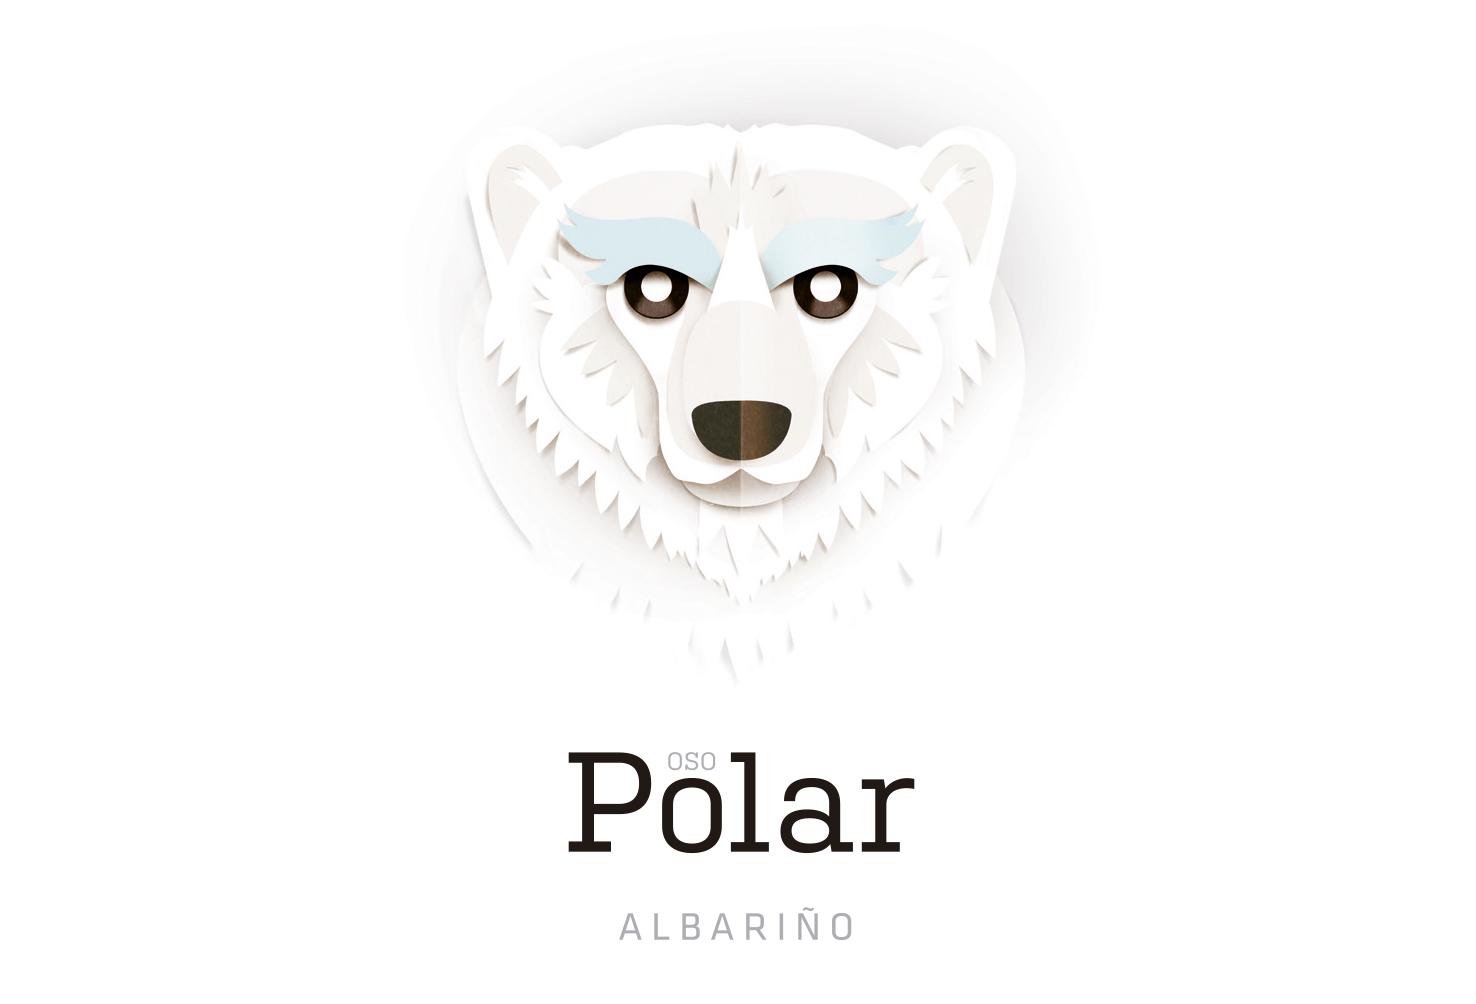 Loa Osa-Polar-Front.jpg